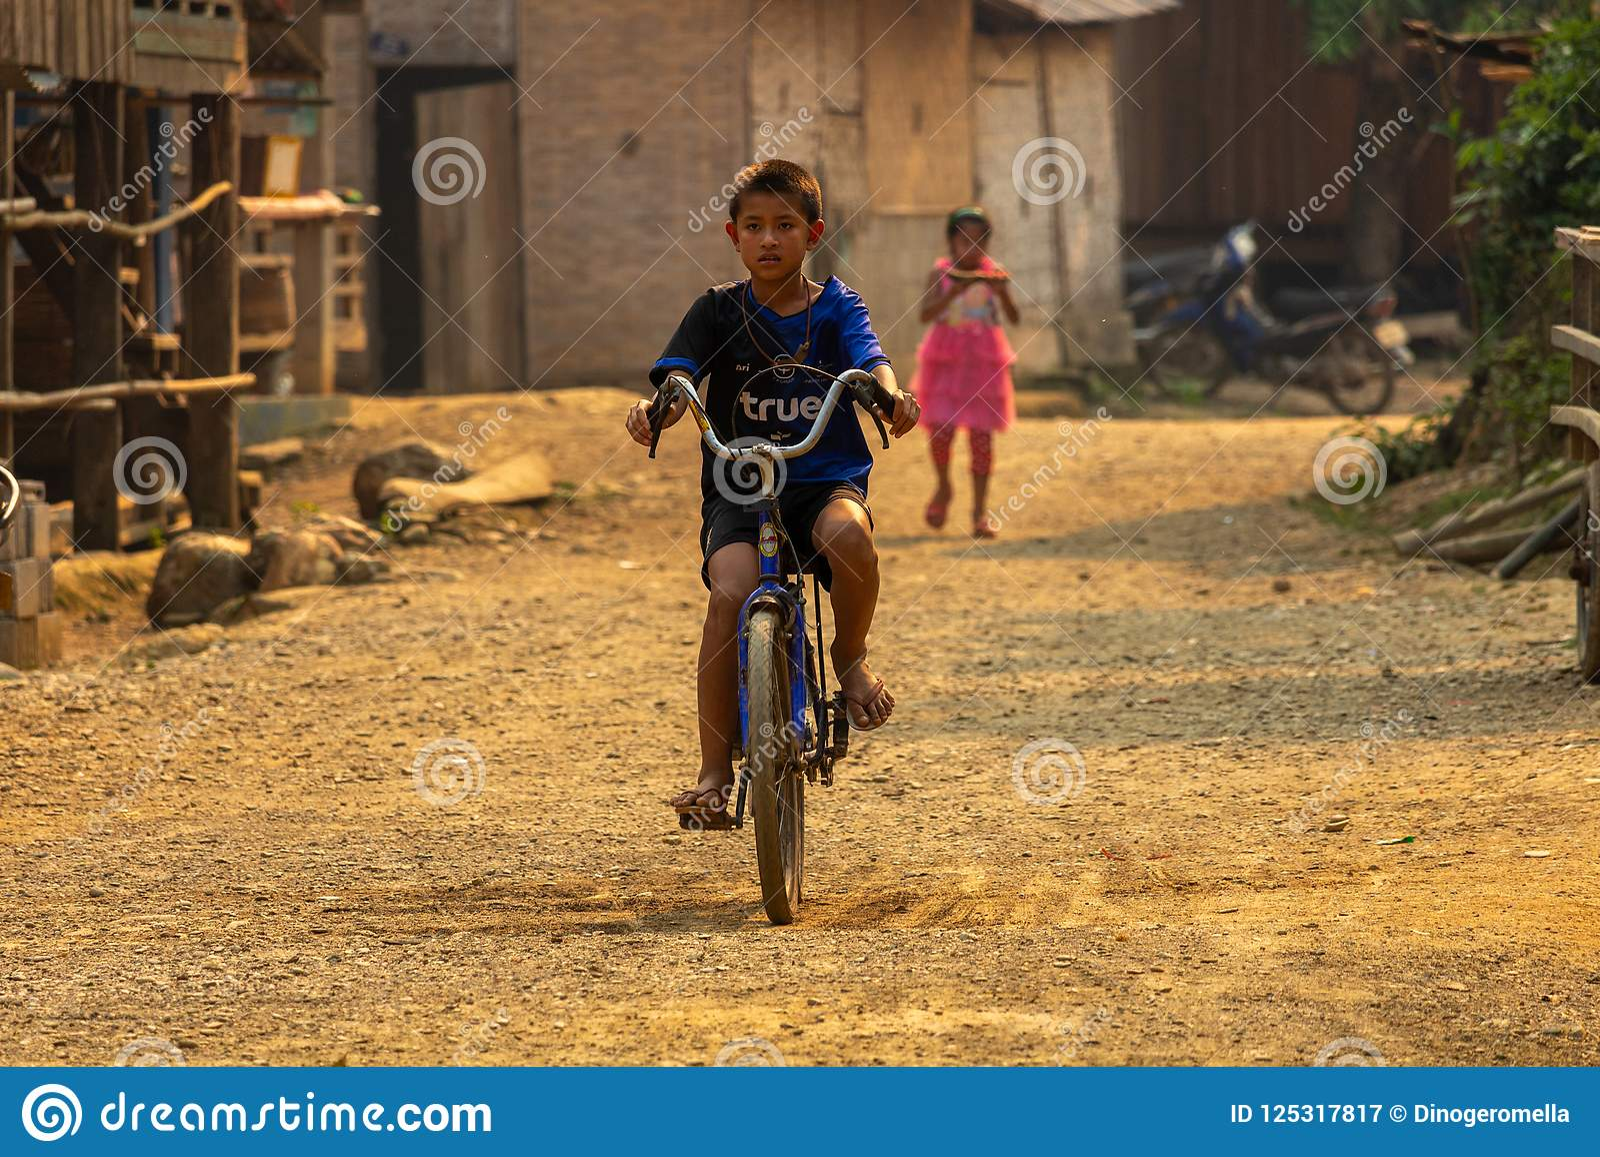 Village child biking Laos